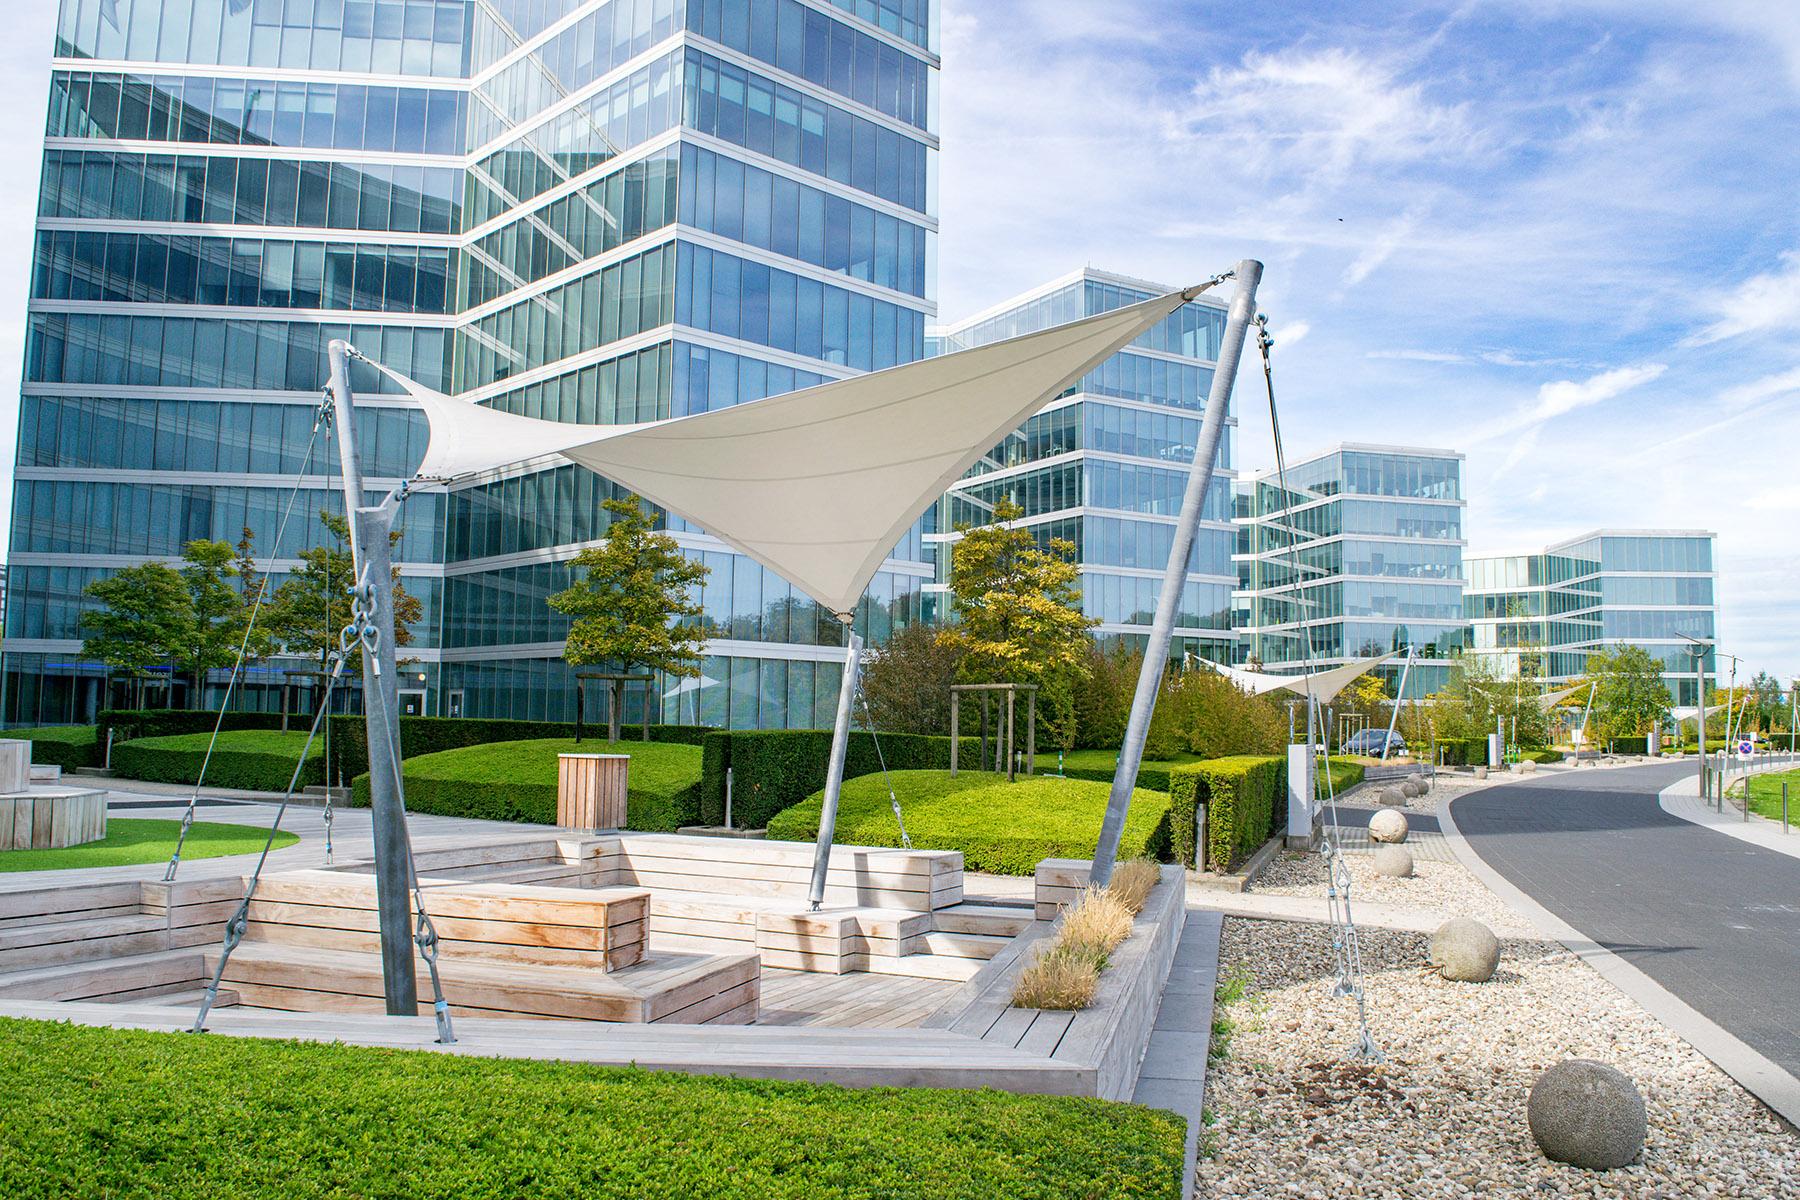 Office buildings in Brussels